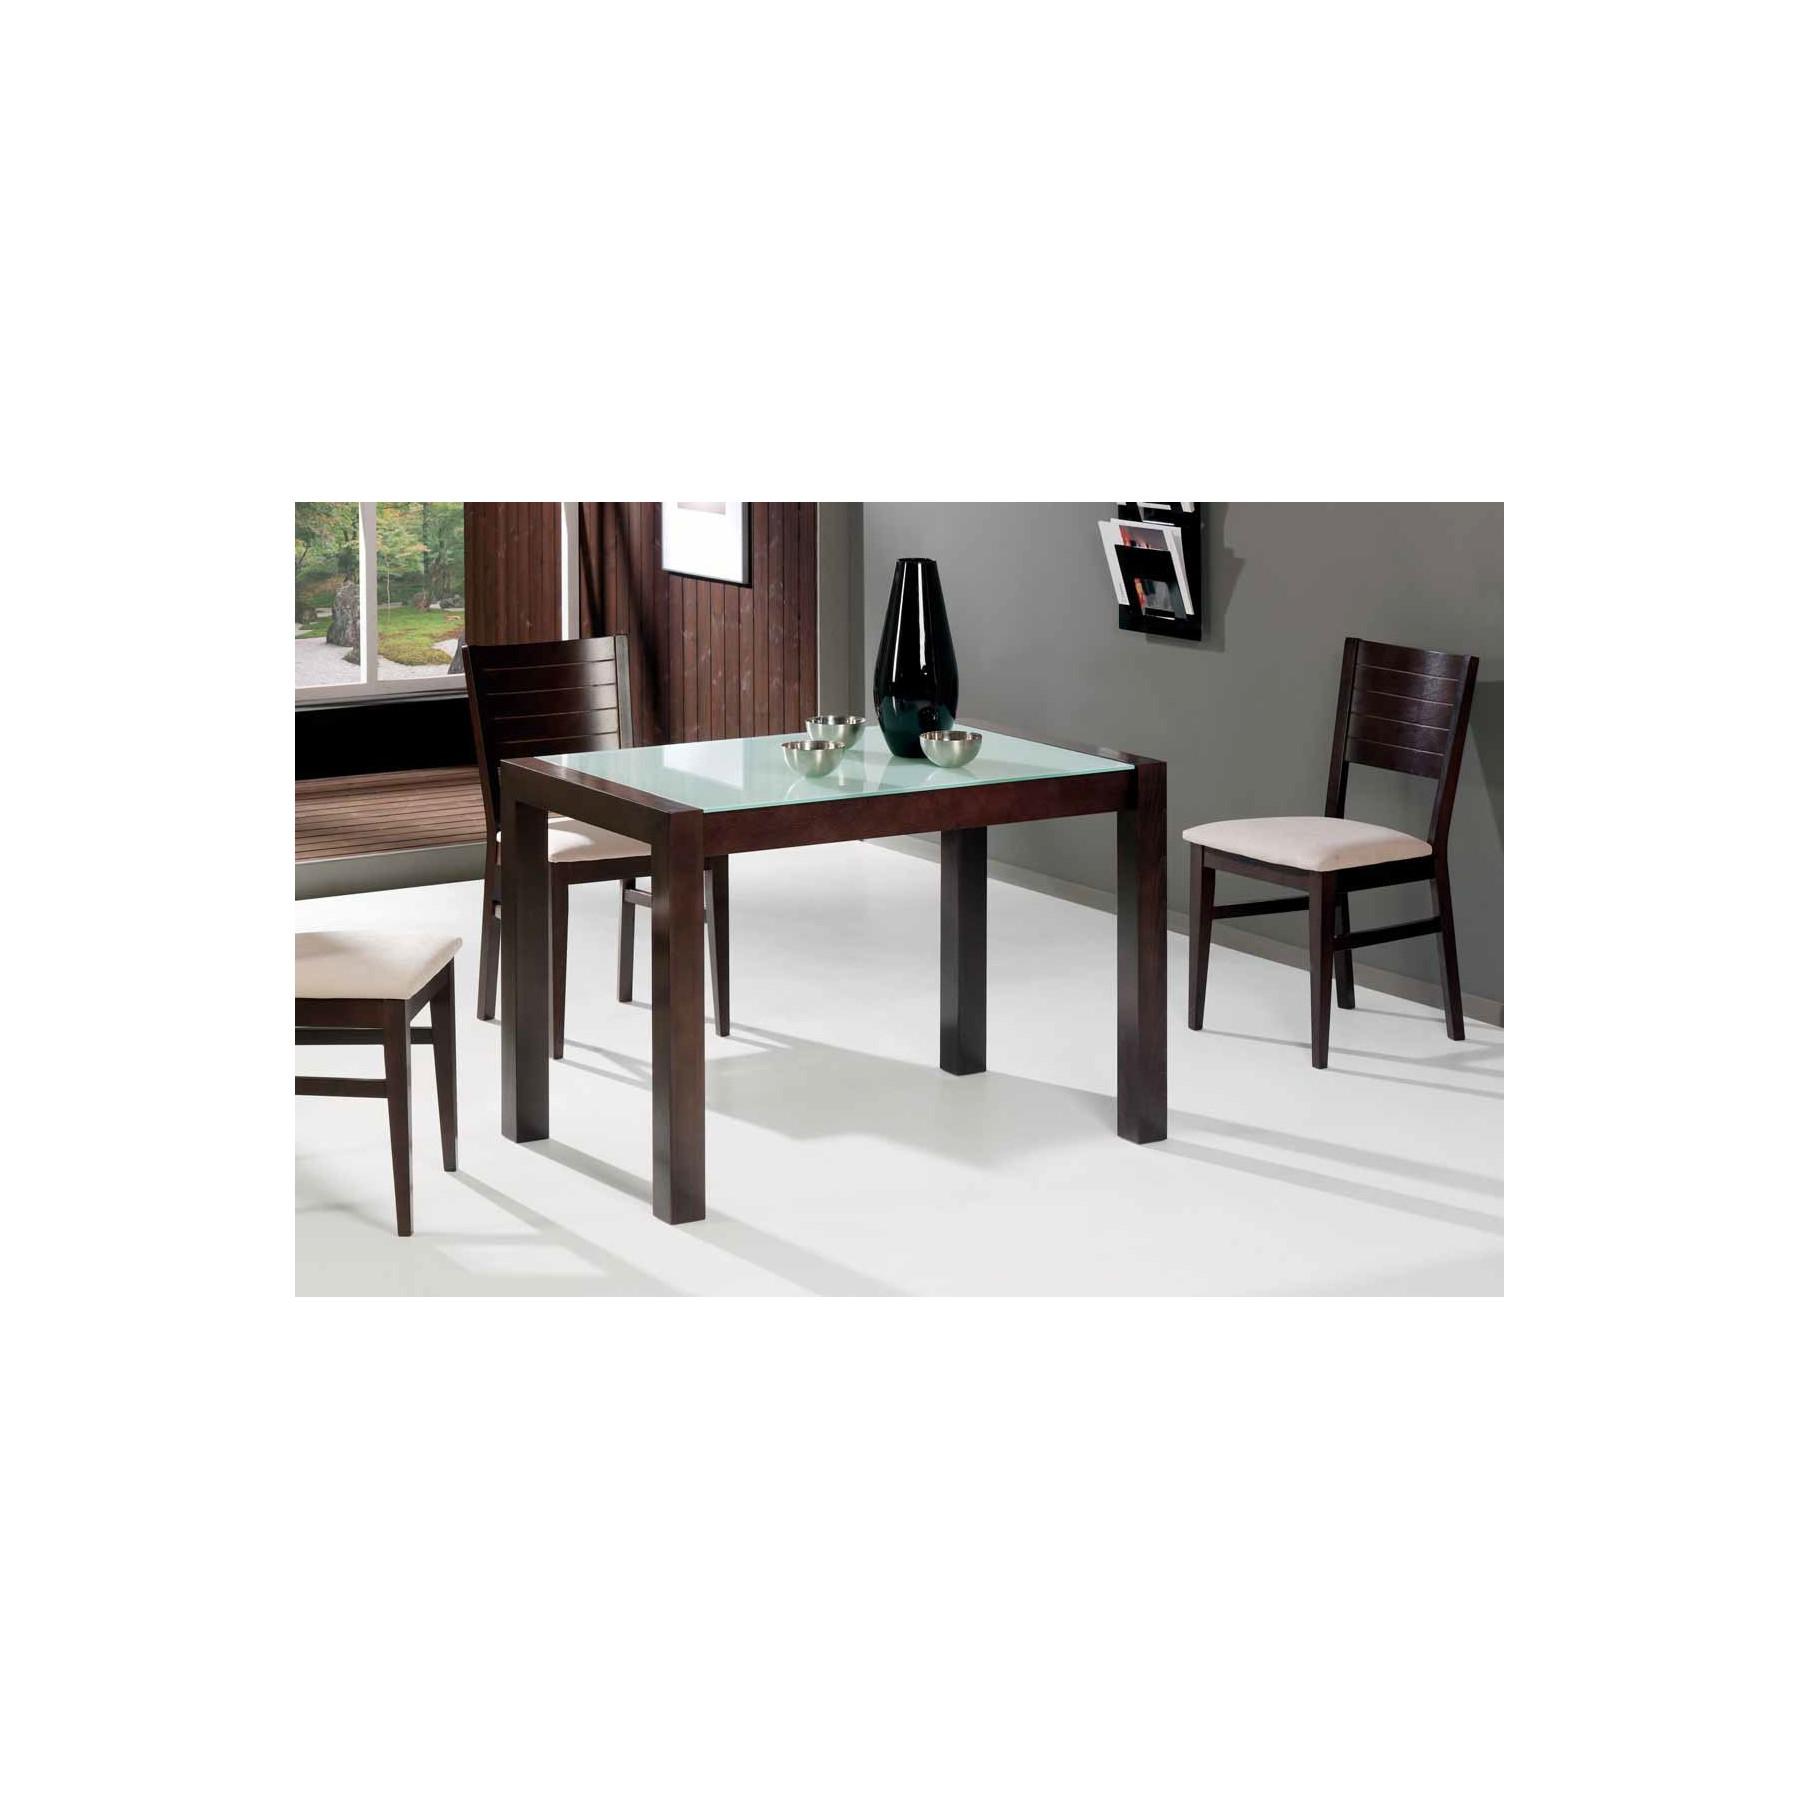 Mesa de cocina de madera extensible y cristal templado for Mesas de cocina extensibles